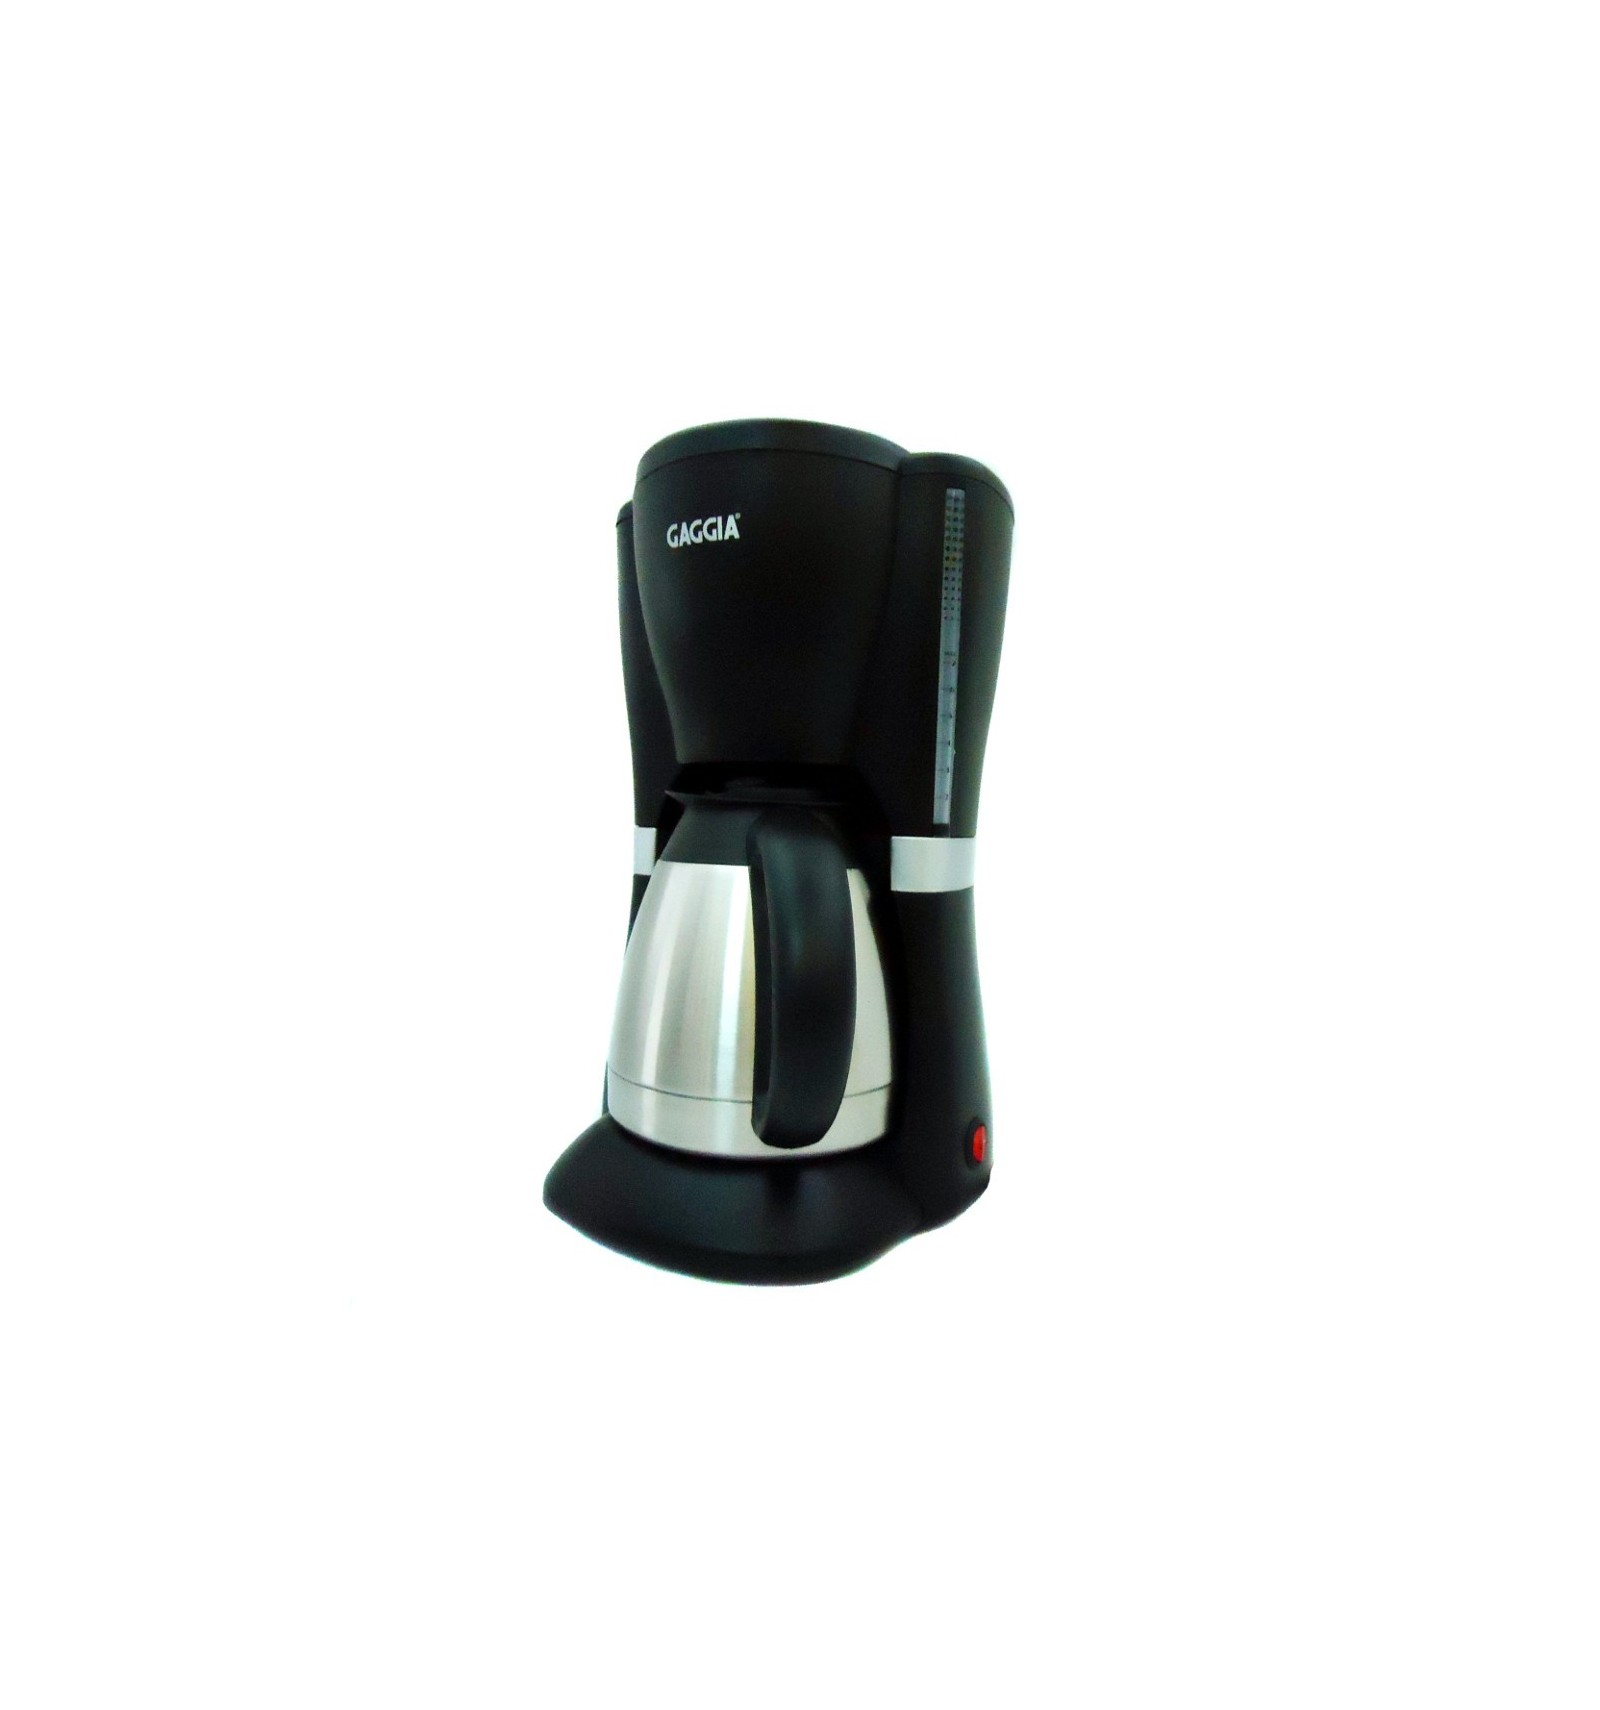 Gaggia G103B Filter Coffee Maker